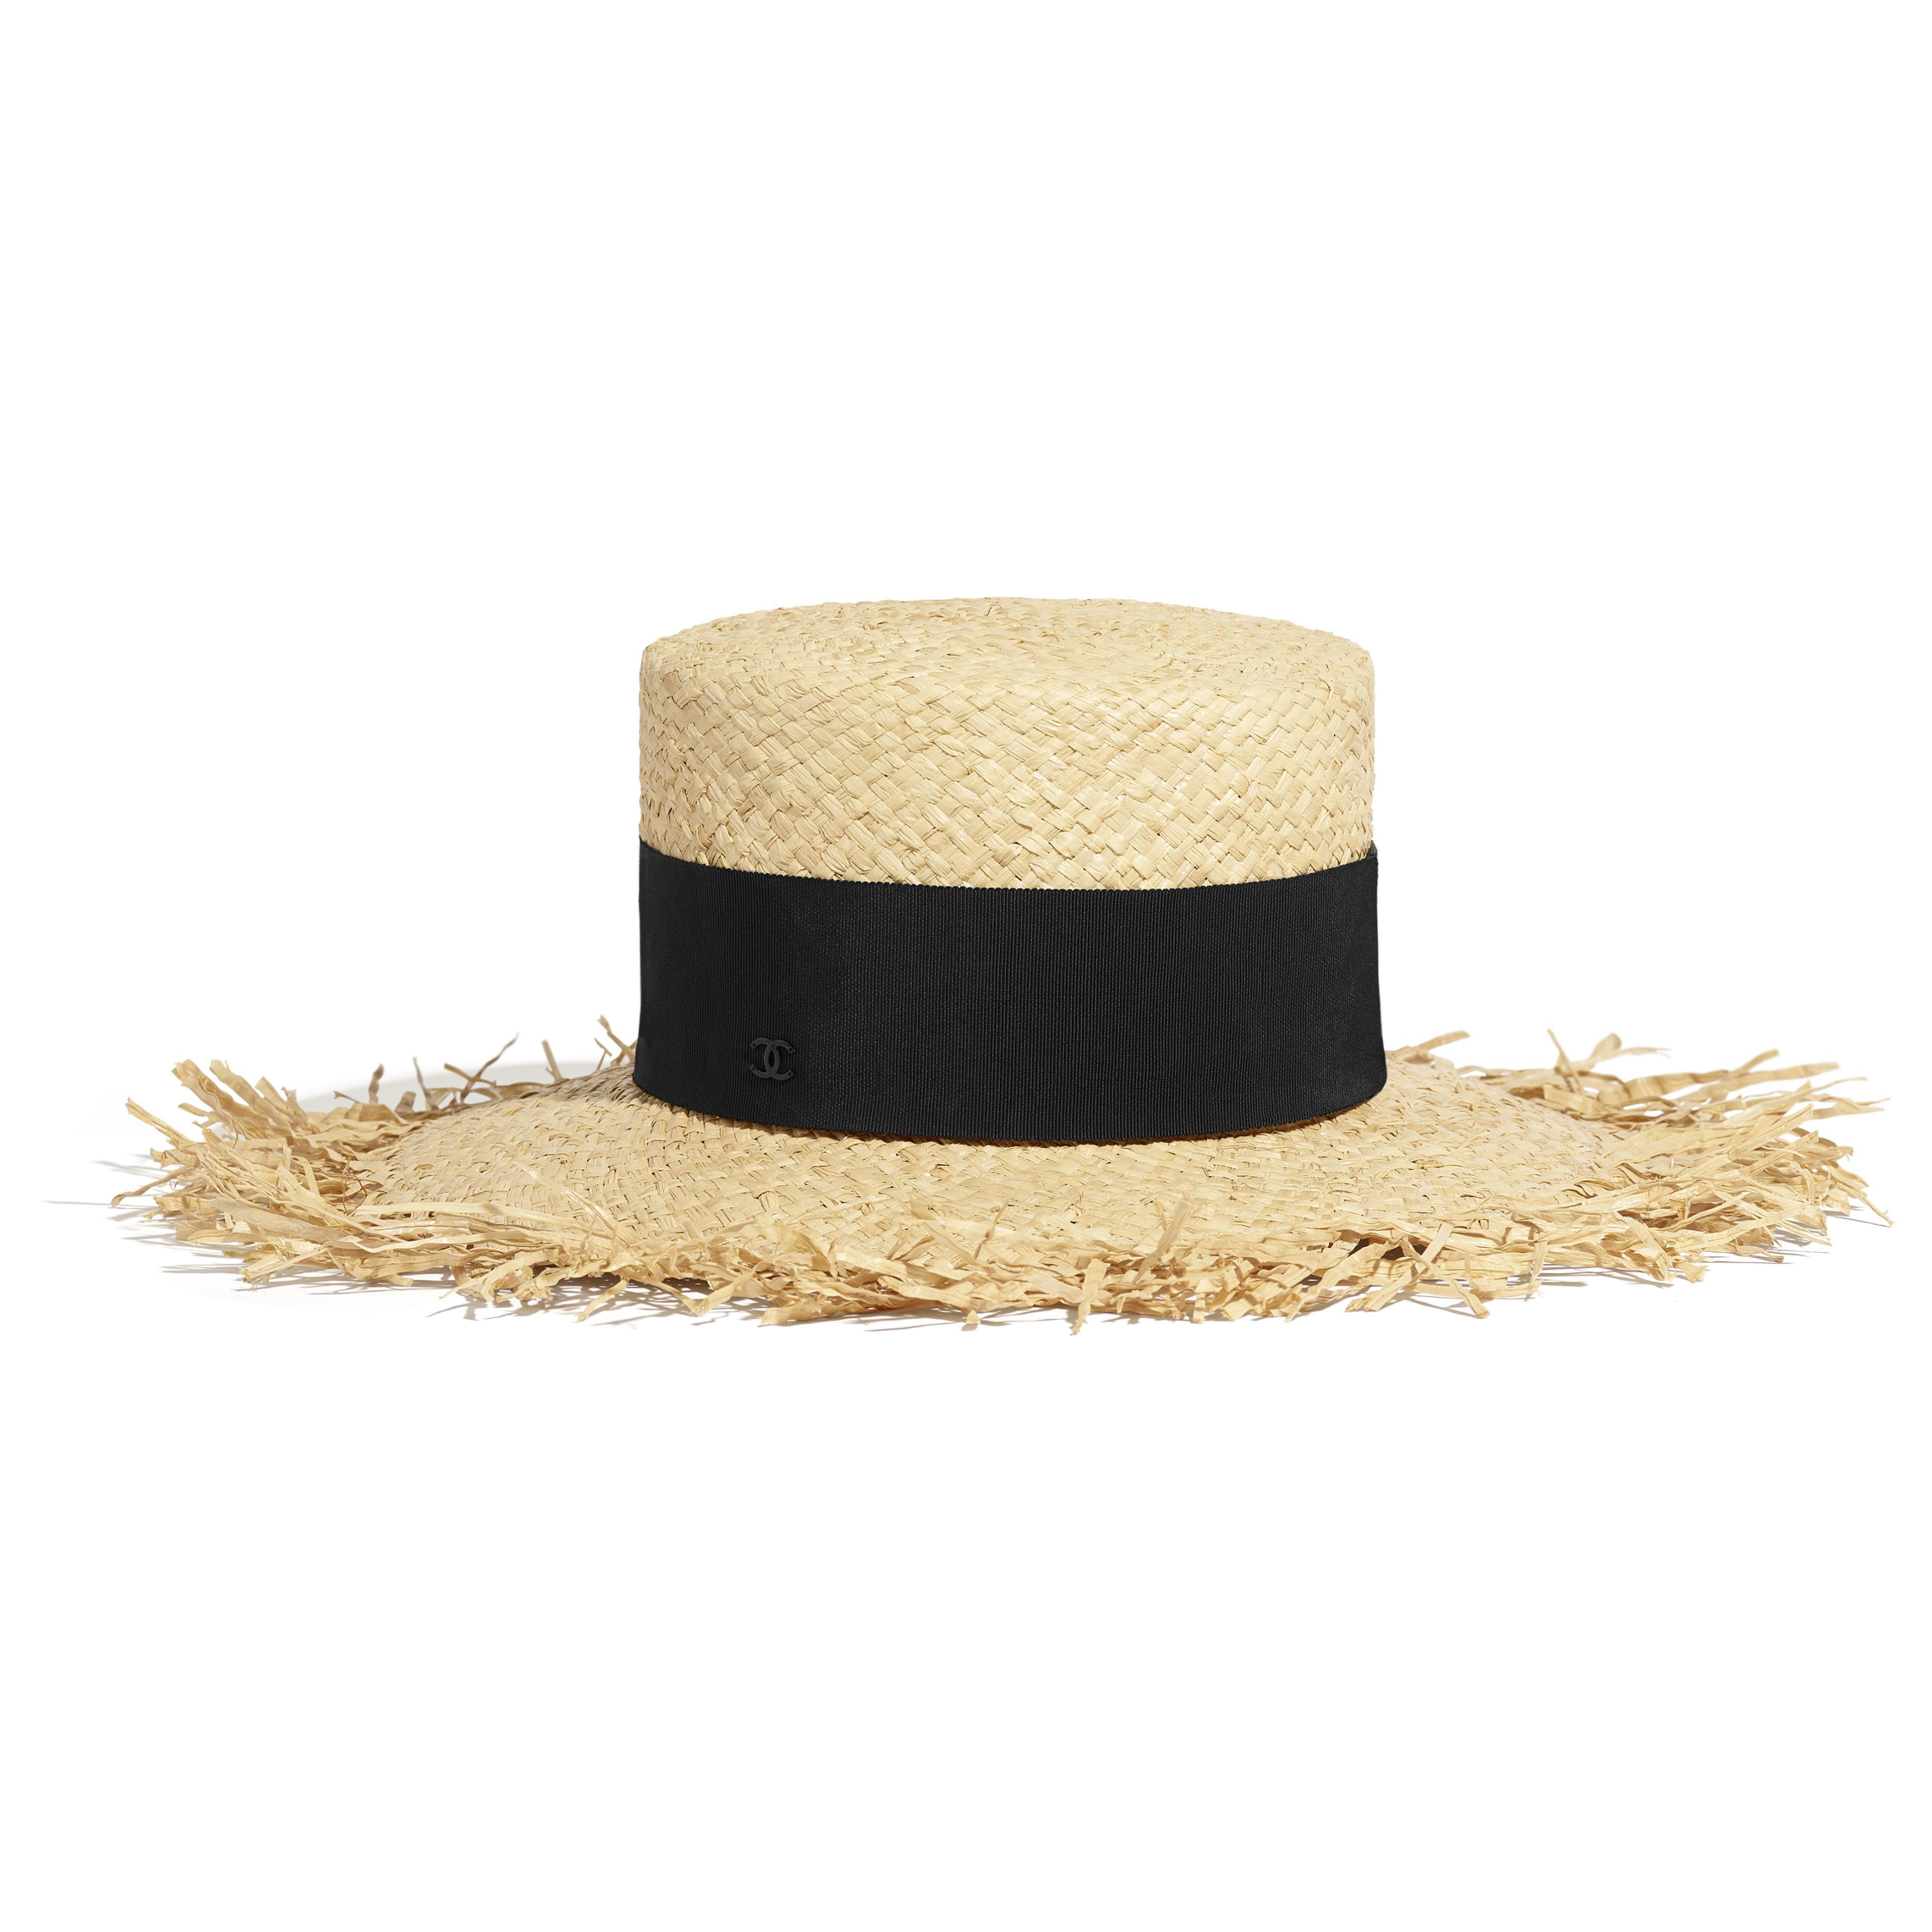 Raffia, Grosgrain & Metal Beige & Black Wide-Brimmed Hat | CHANEL